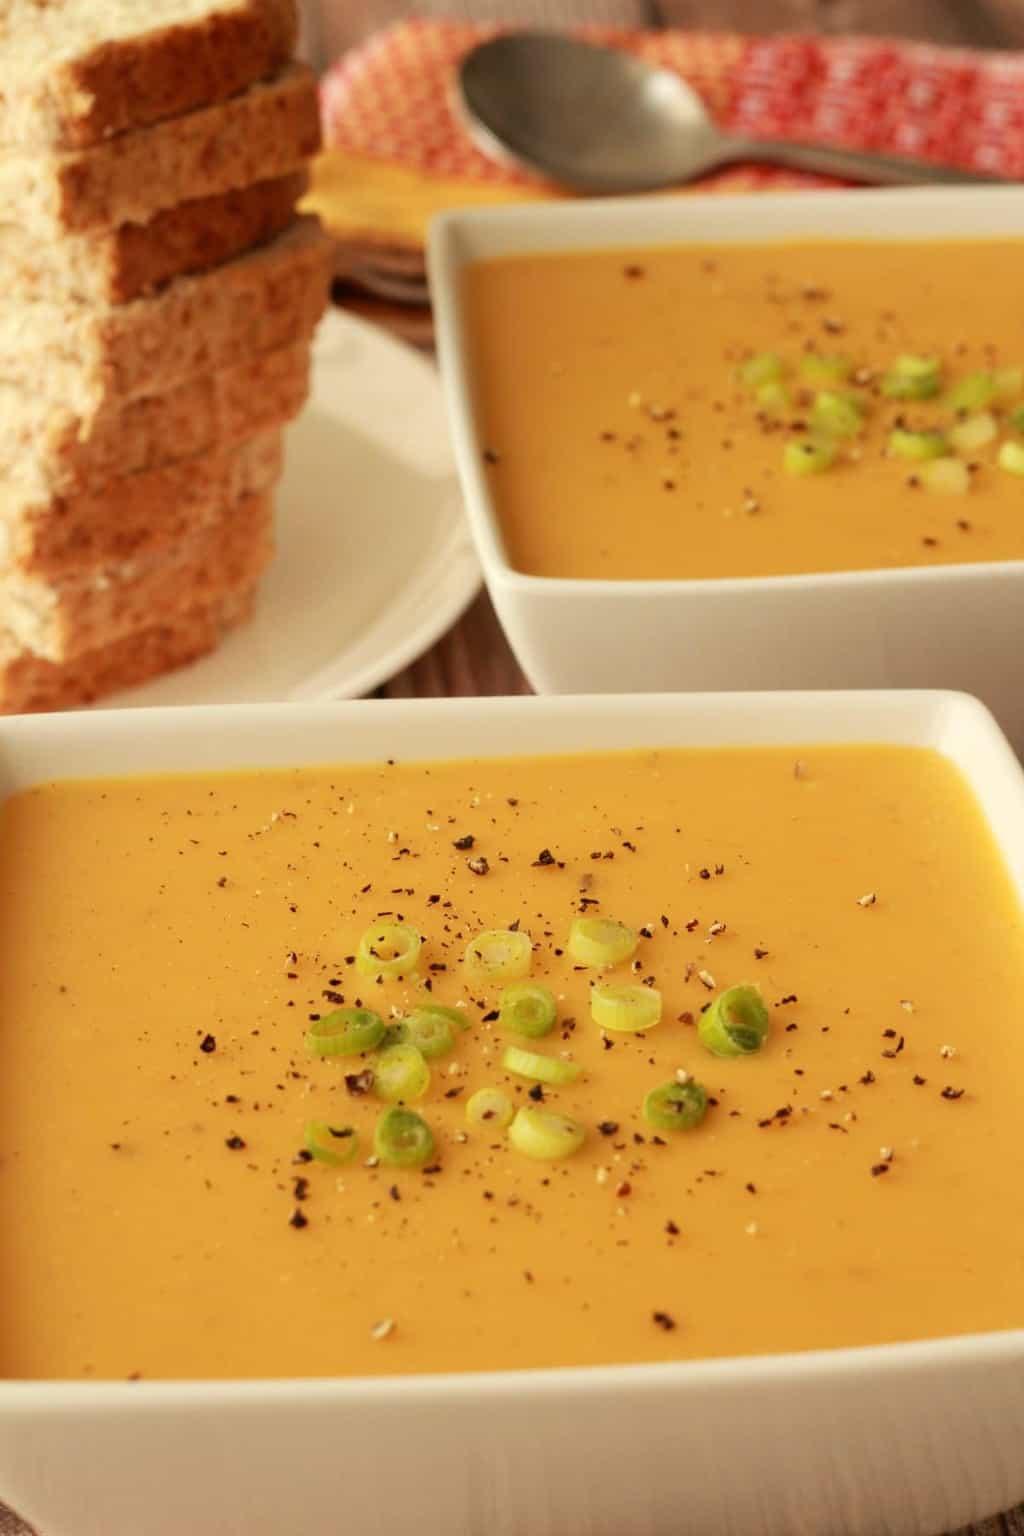 Vegan Split Pea Soup. This yellow split pea soup is hearty, filling and delicious! Have it an appetizer or an entree. #vegan #lovingitvegan #splitpeasoup #soups